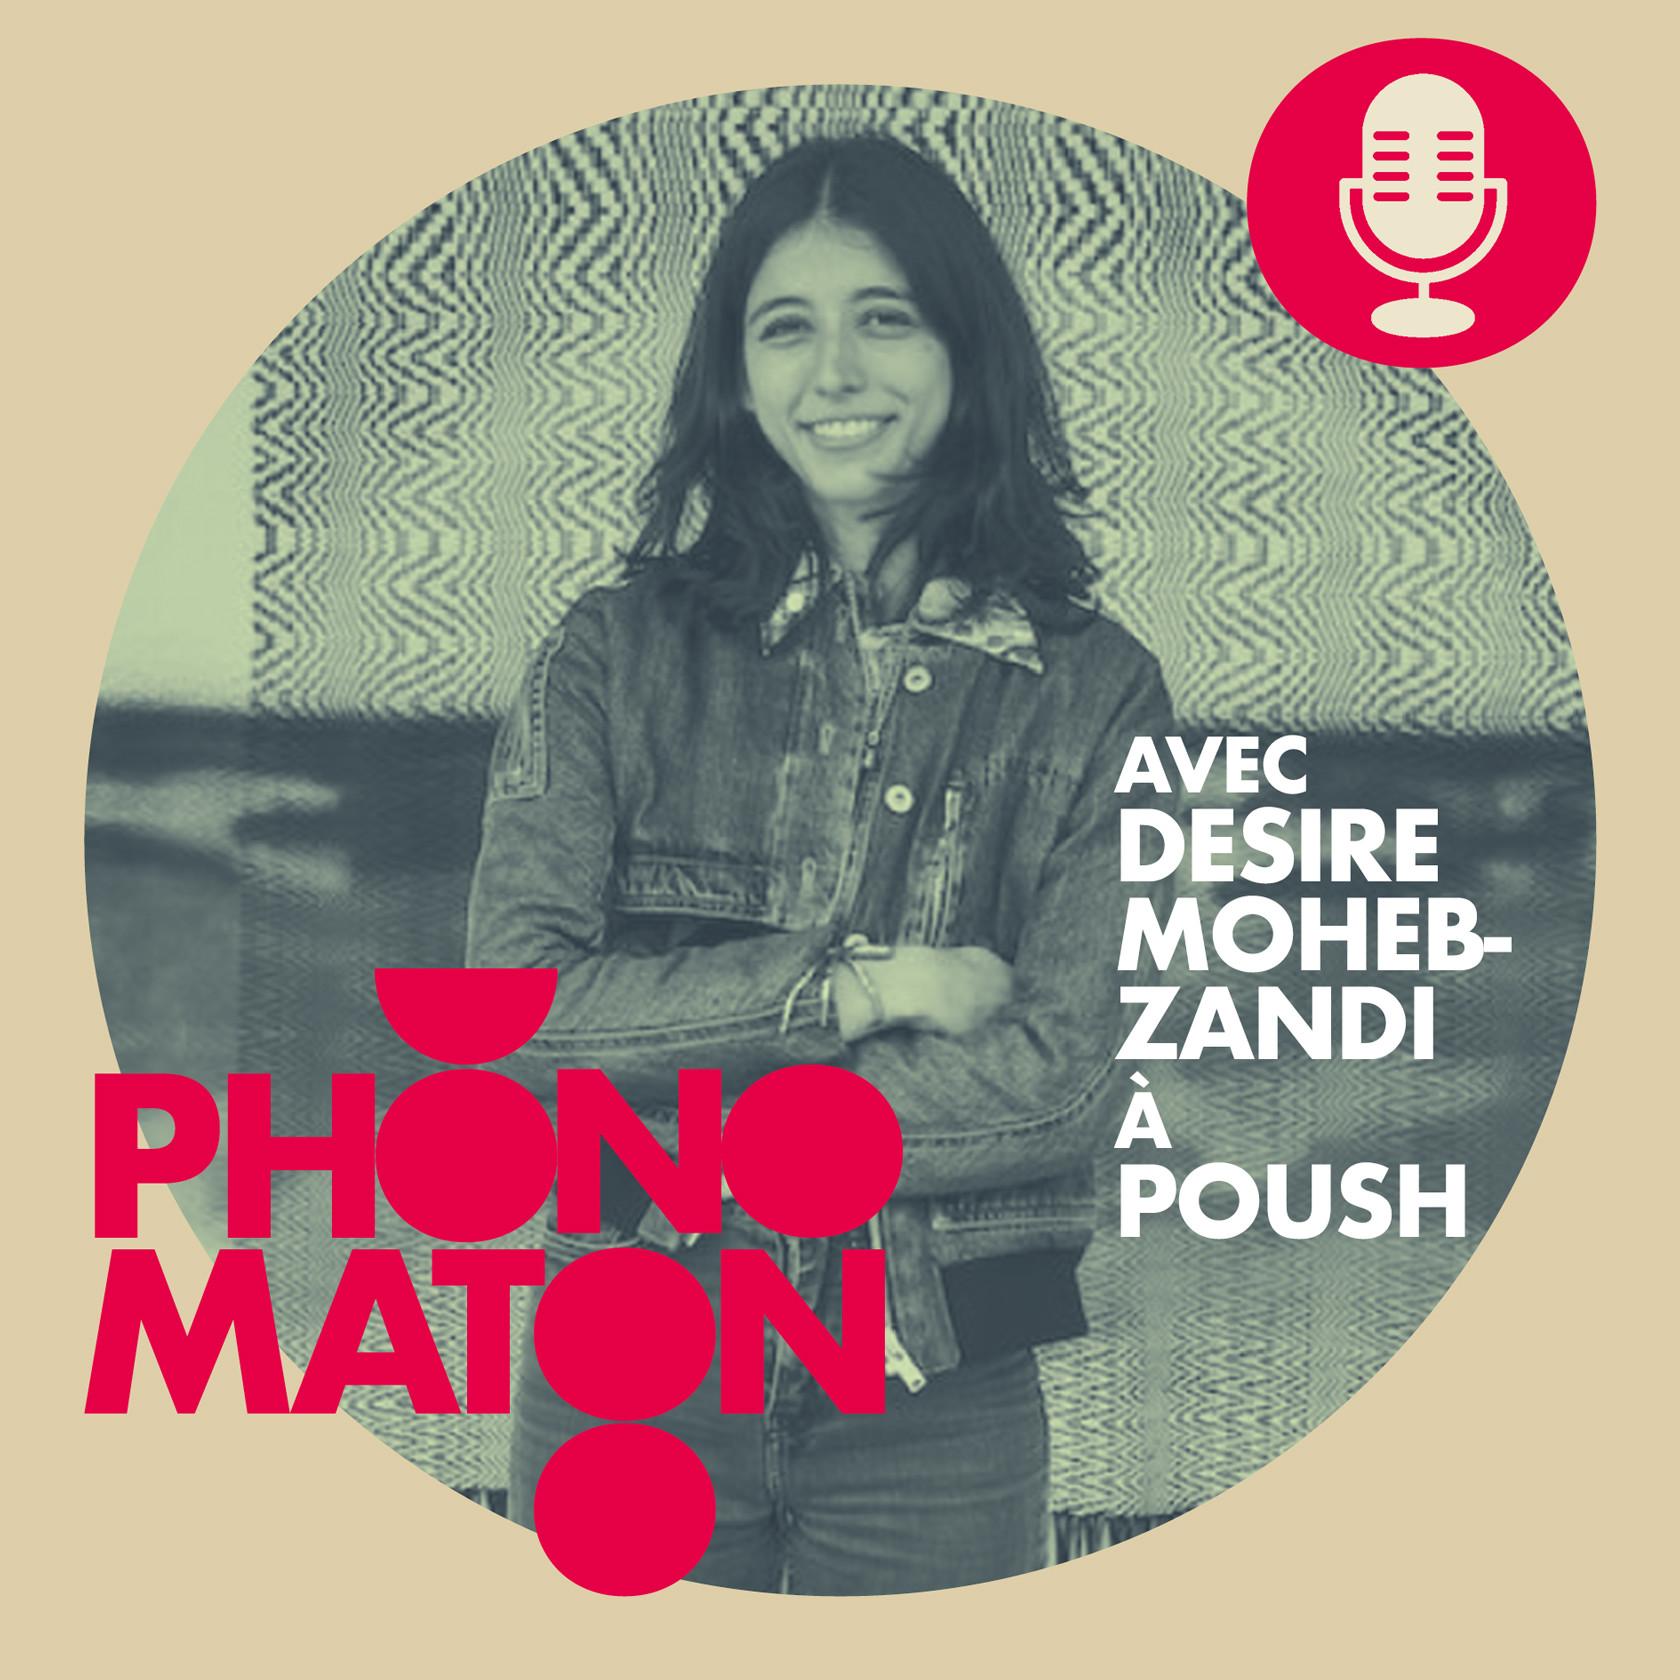 Phonomaton avec Desire Moheb-Zandi à Poush